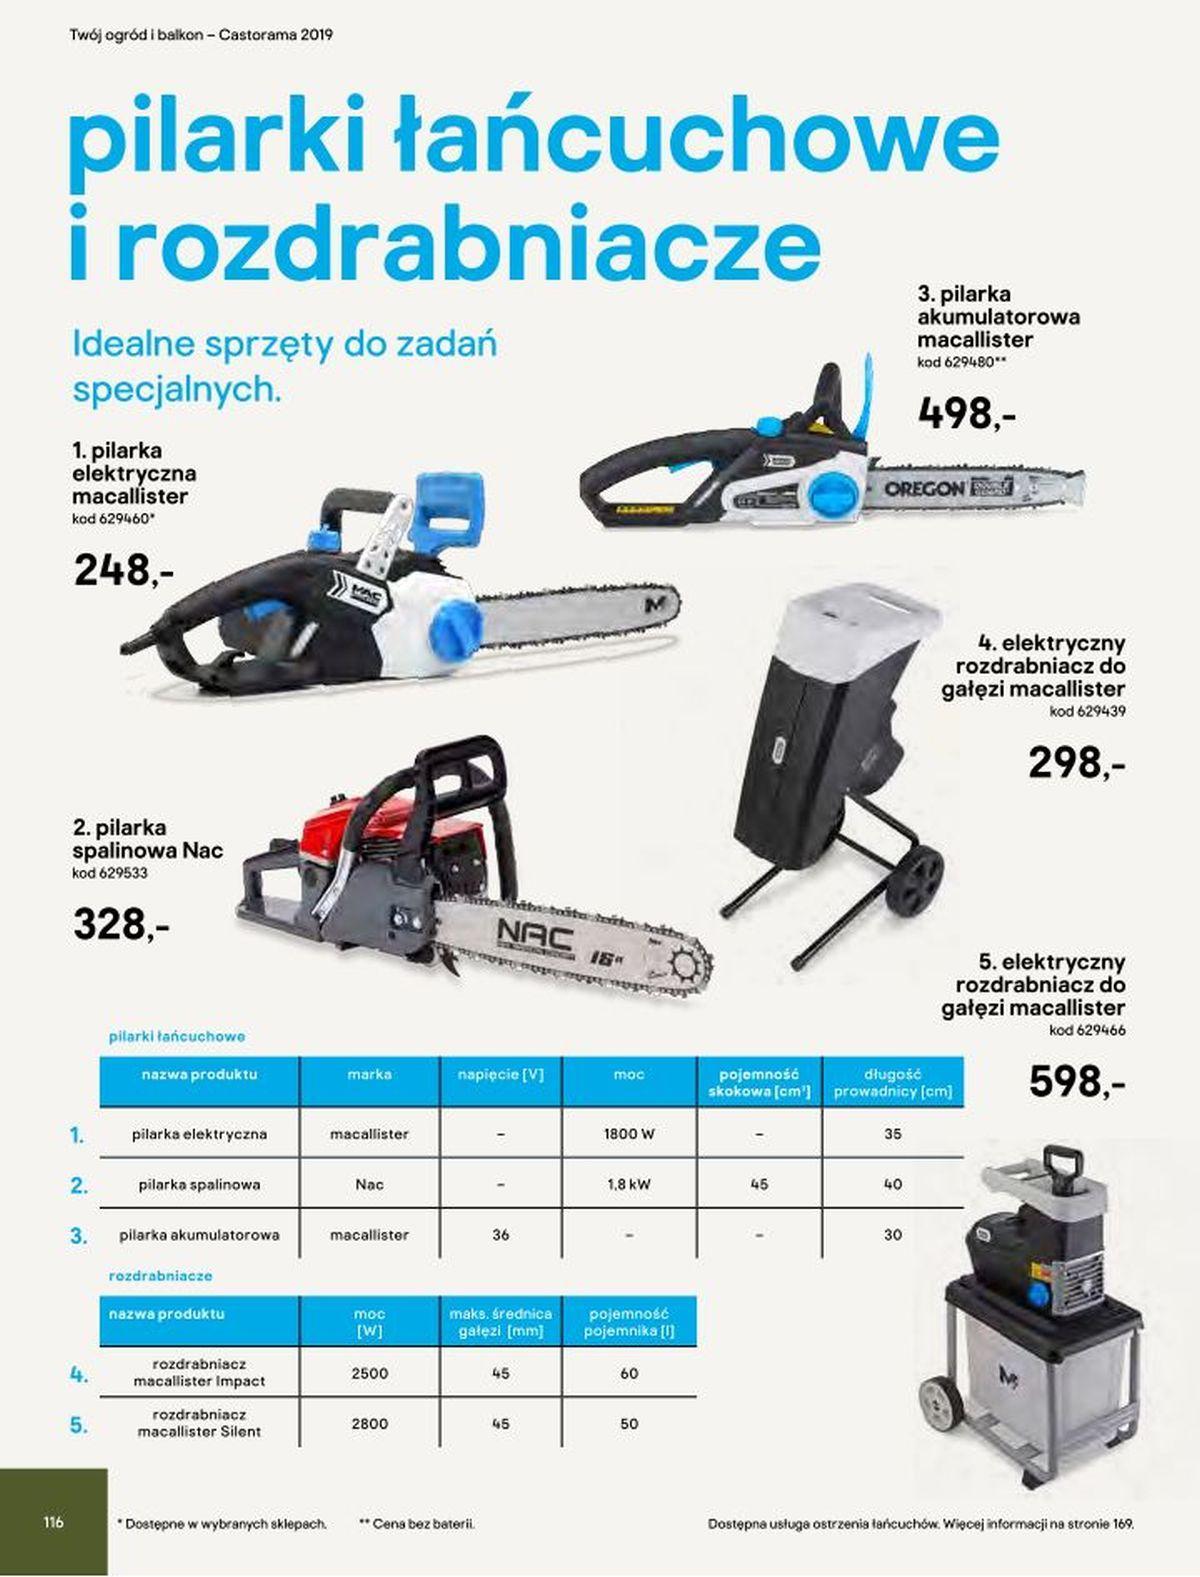 Gazetka promocyjna Castorama do 31/12/2019 str.109